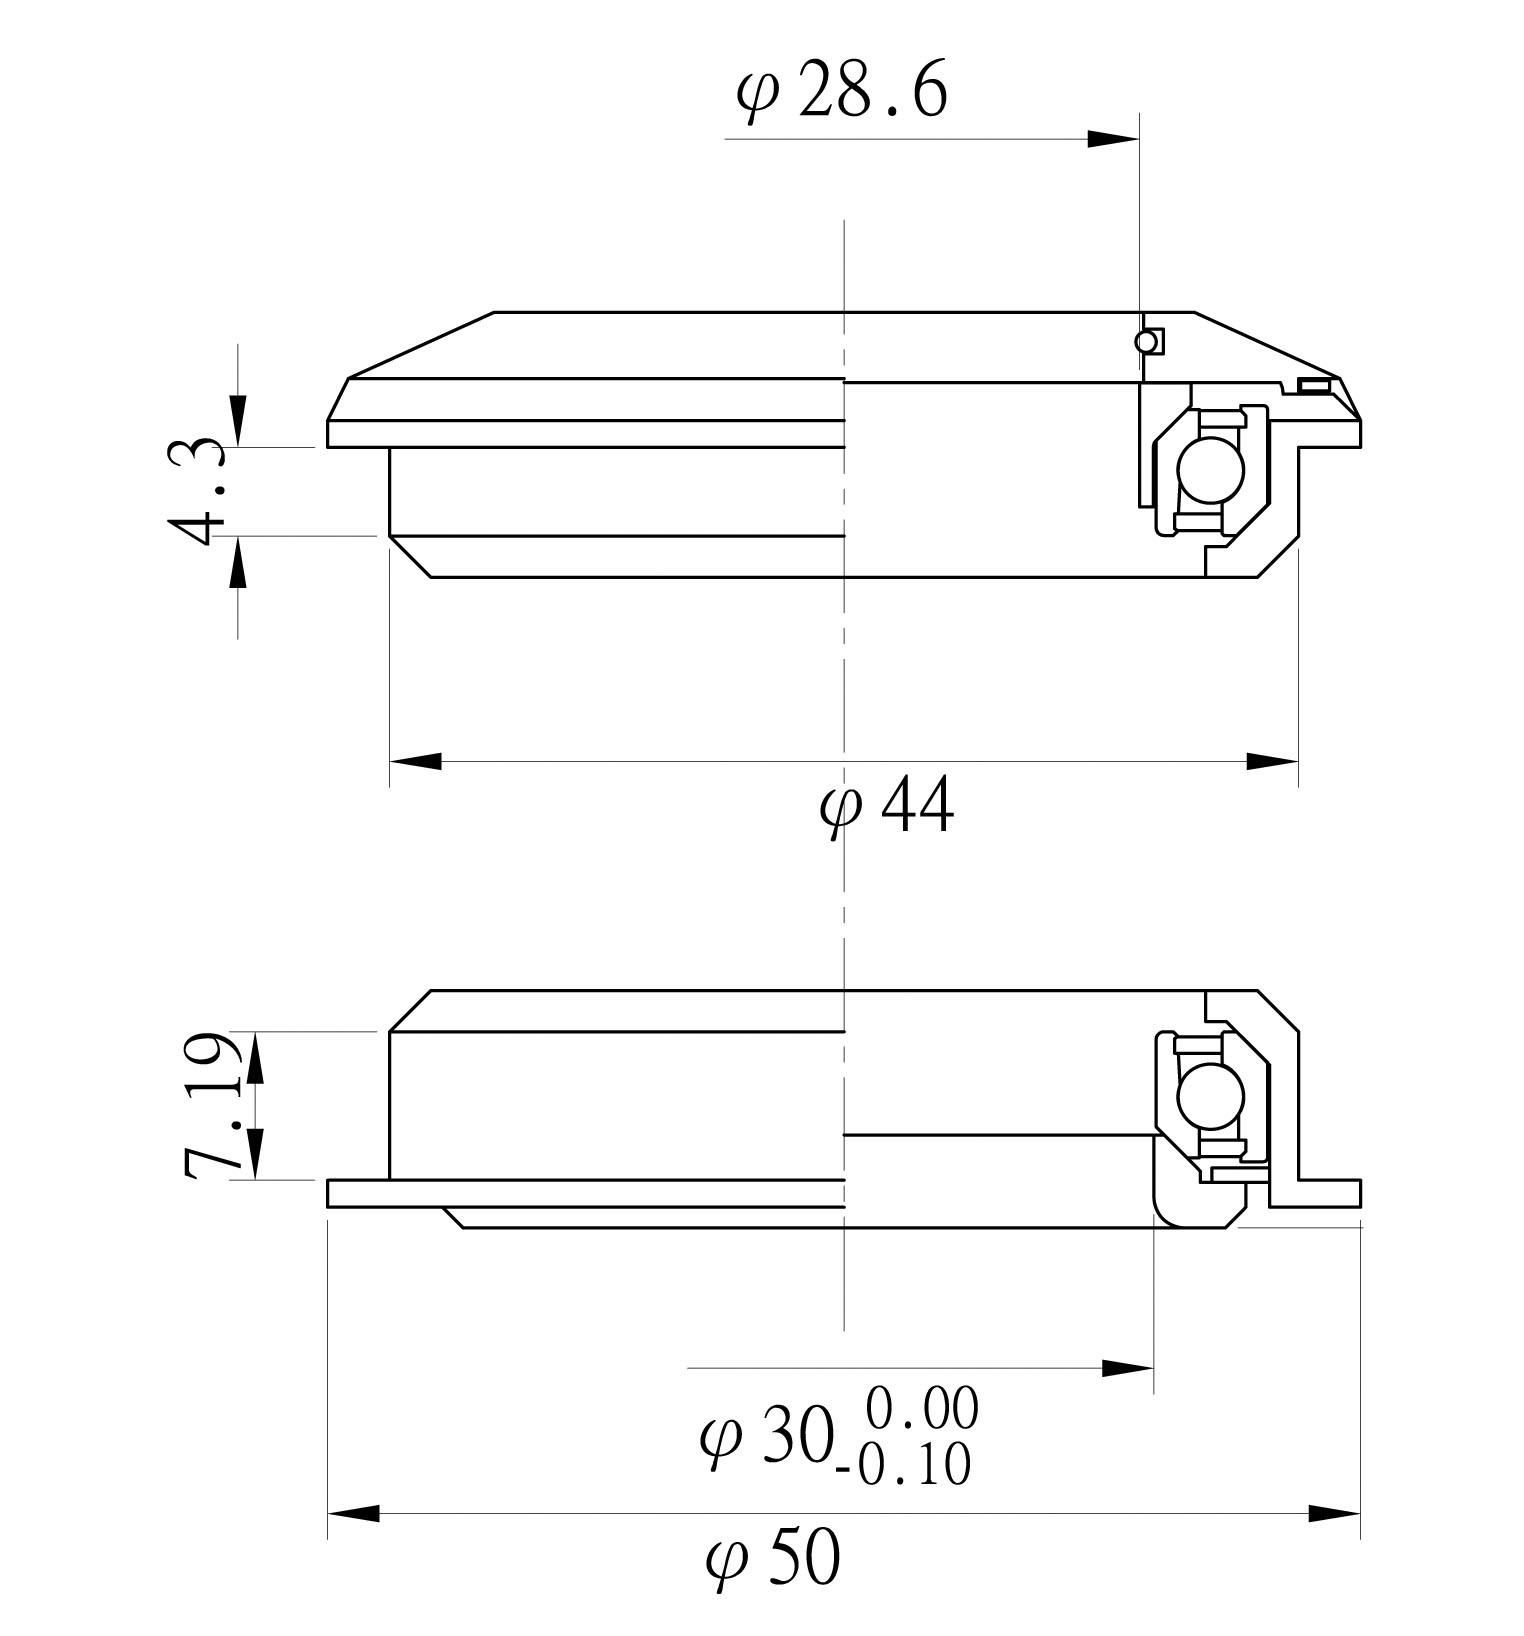 Tange Seiki Semi Integrated Headset 11 8 Inch Internet Bikes Romans Block Diagram